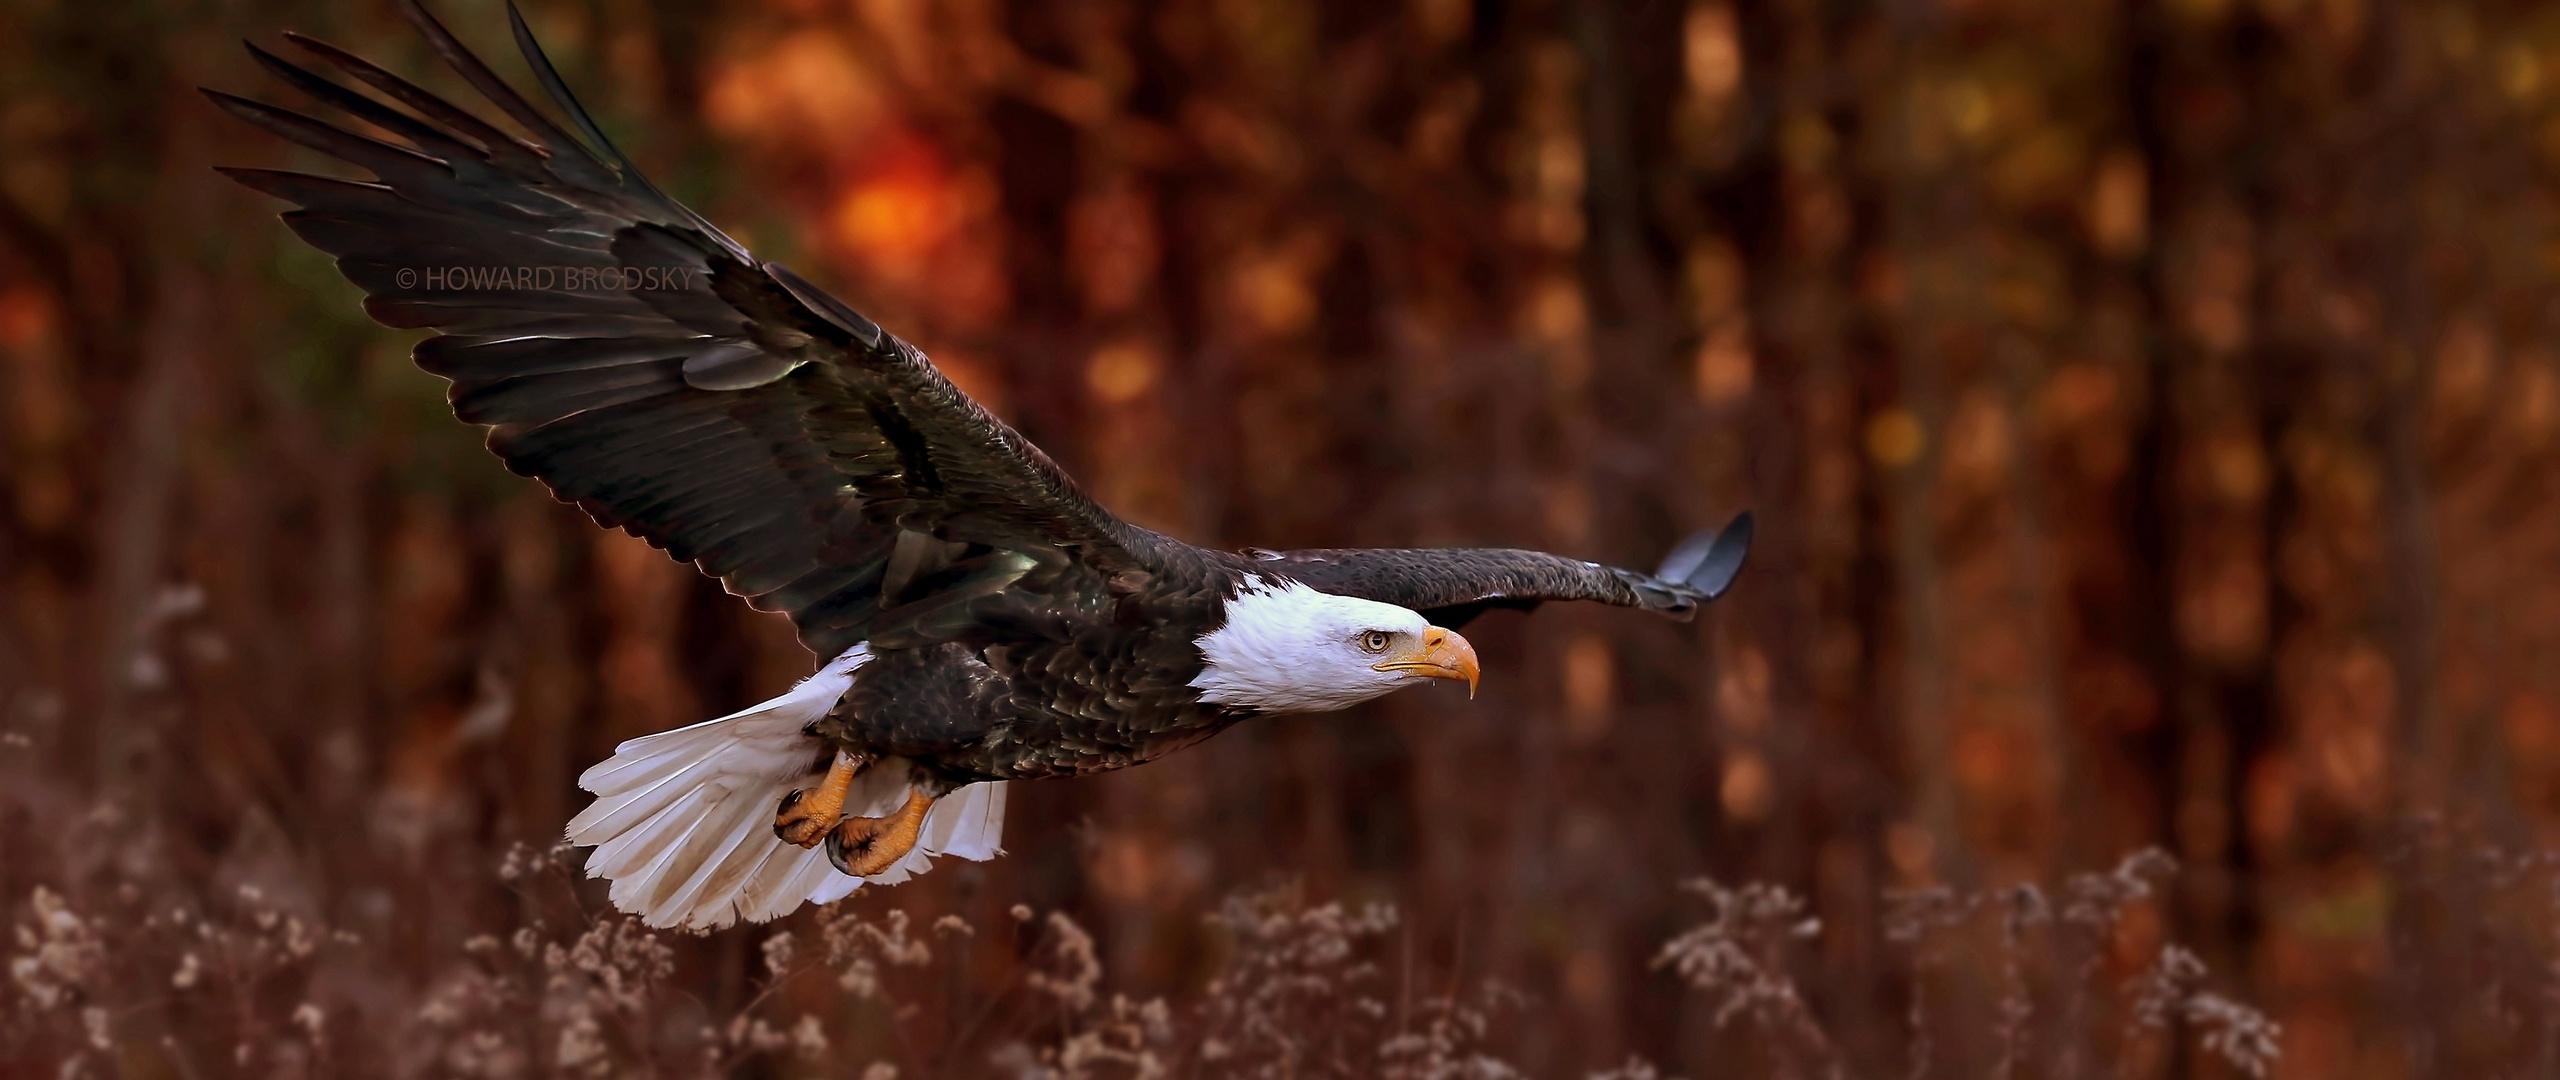 bald-eagle-flight-sq.jpg